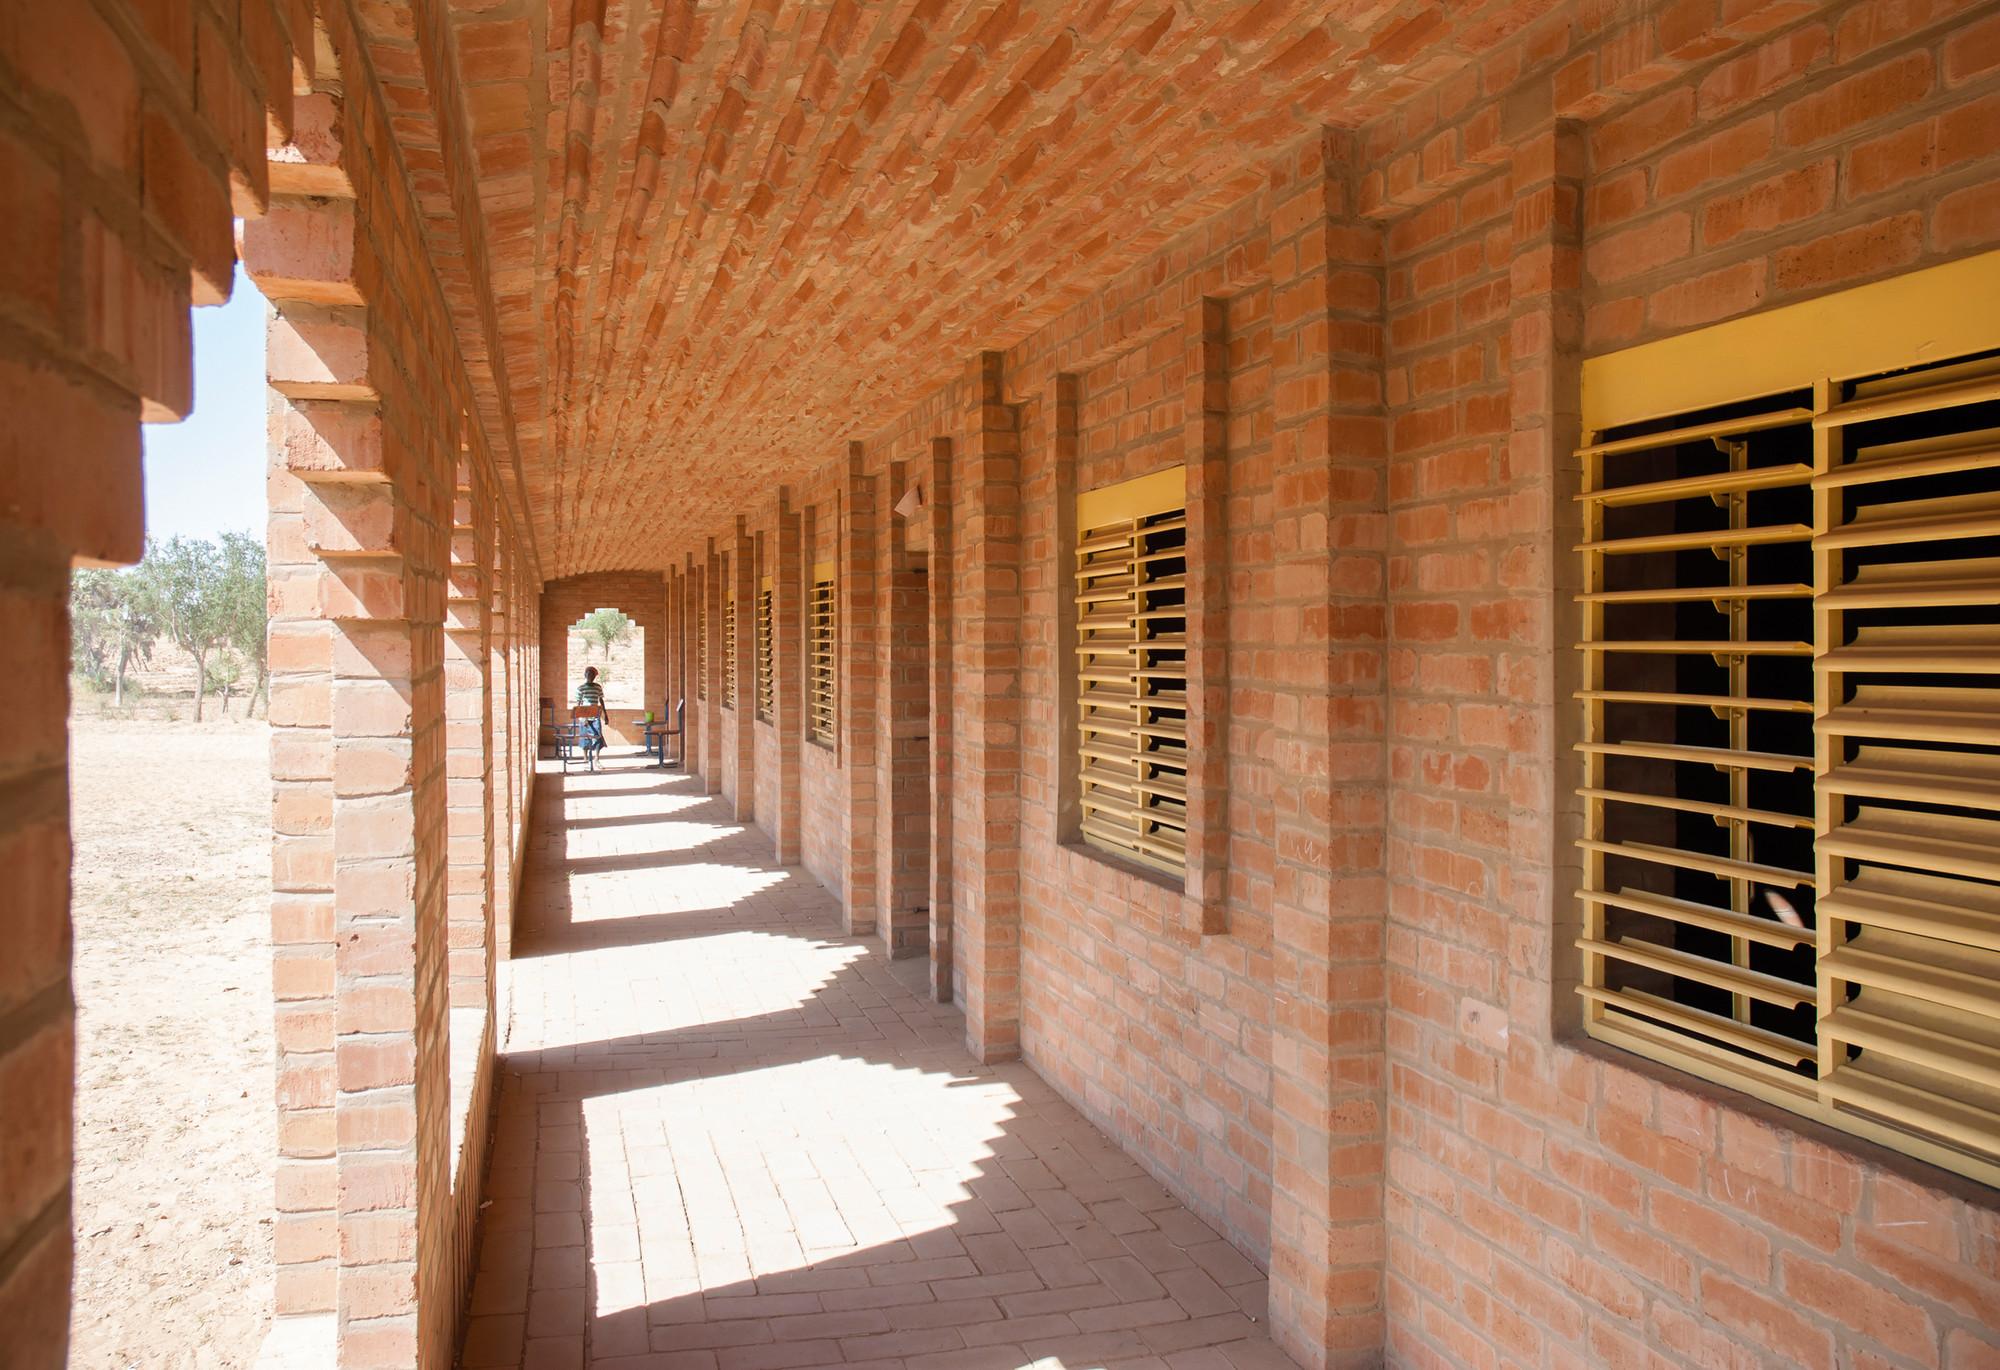 Primary School Tanouan Ibi / LEVS architecten